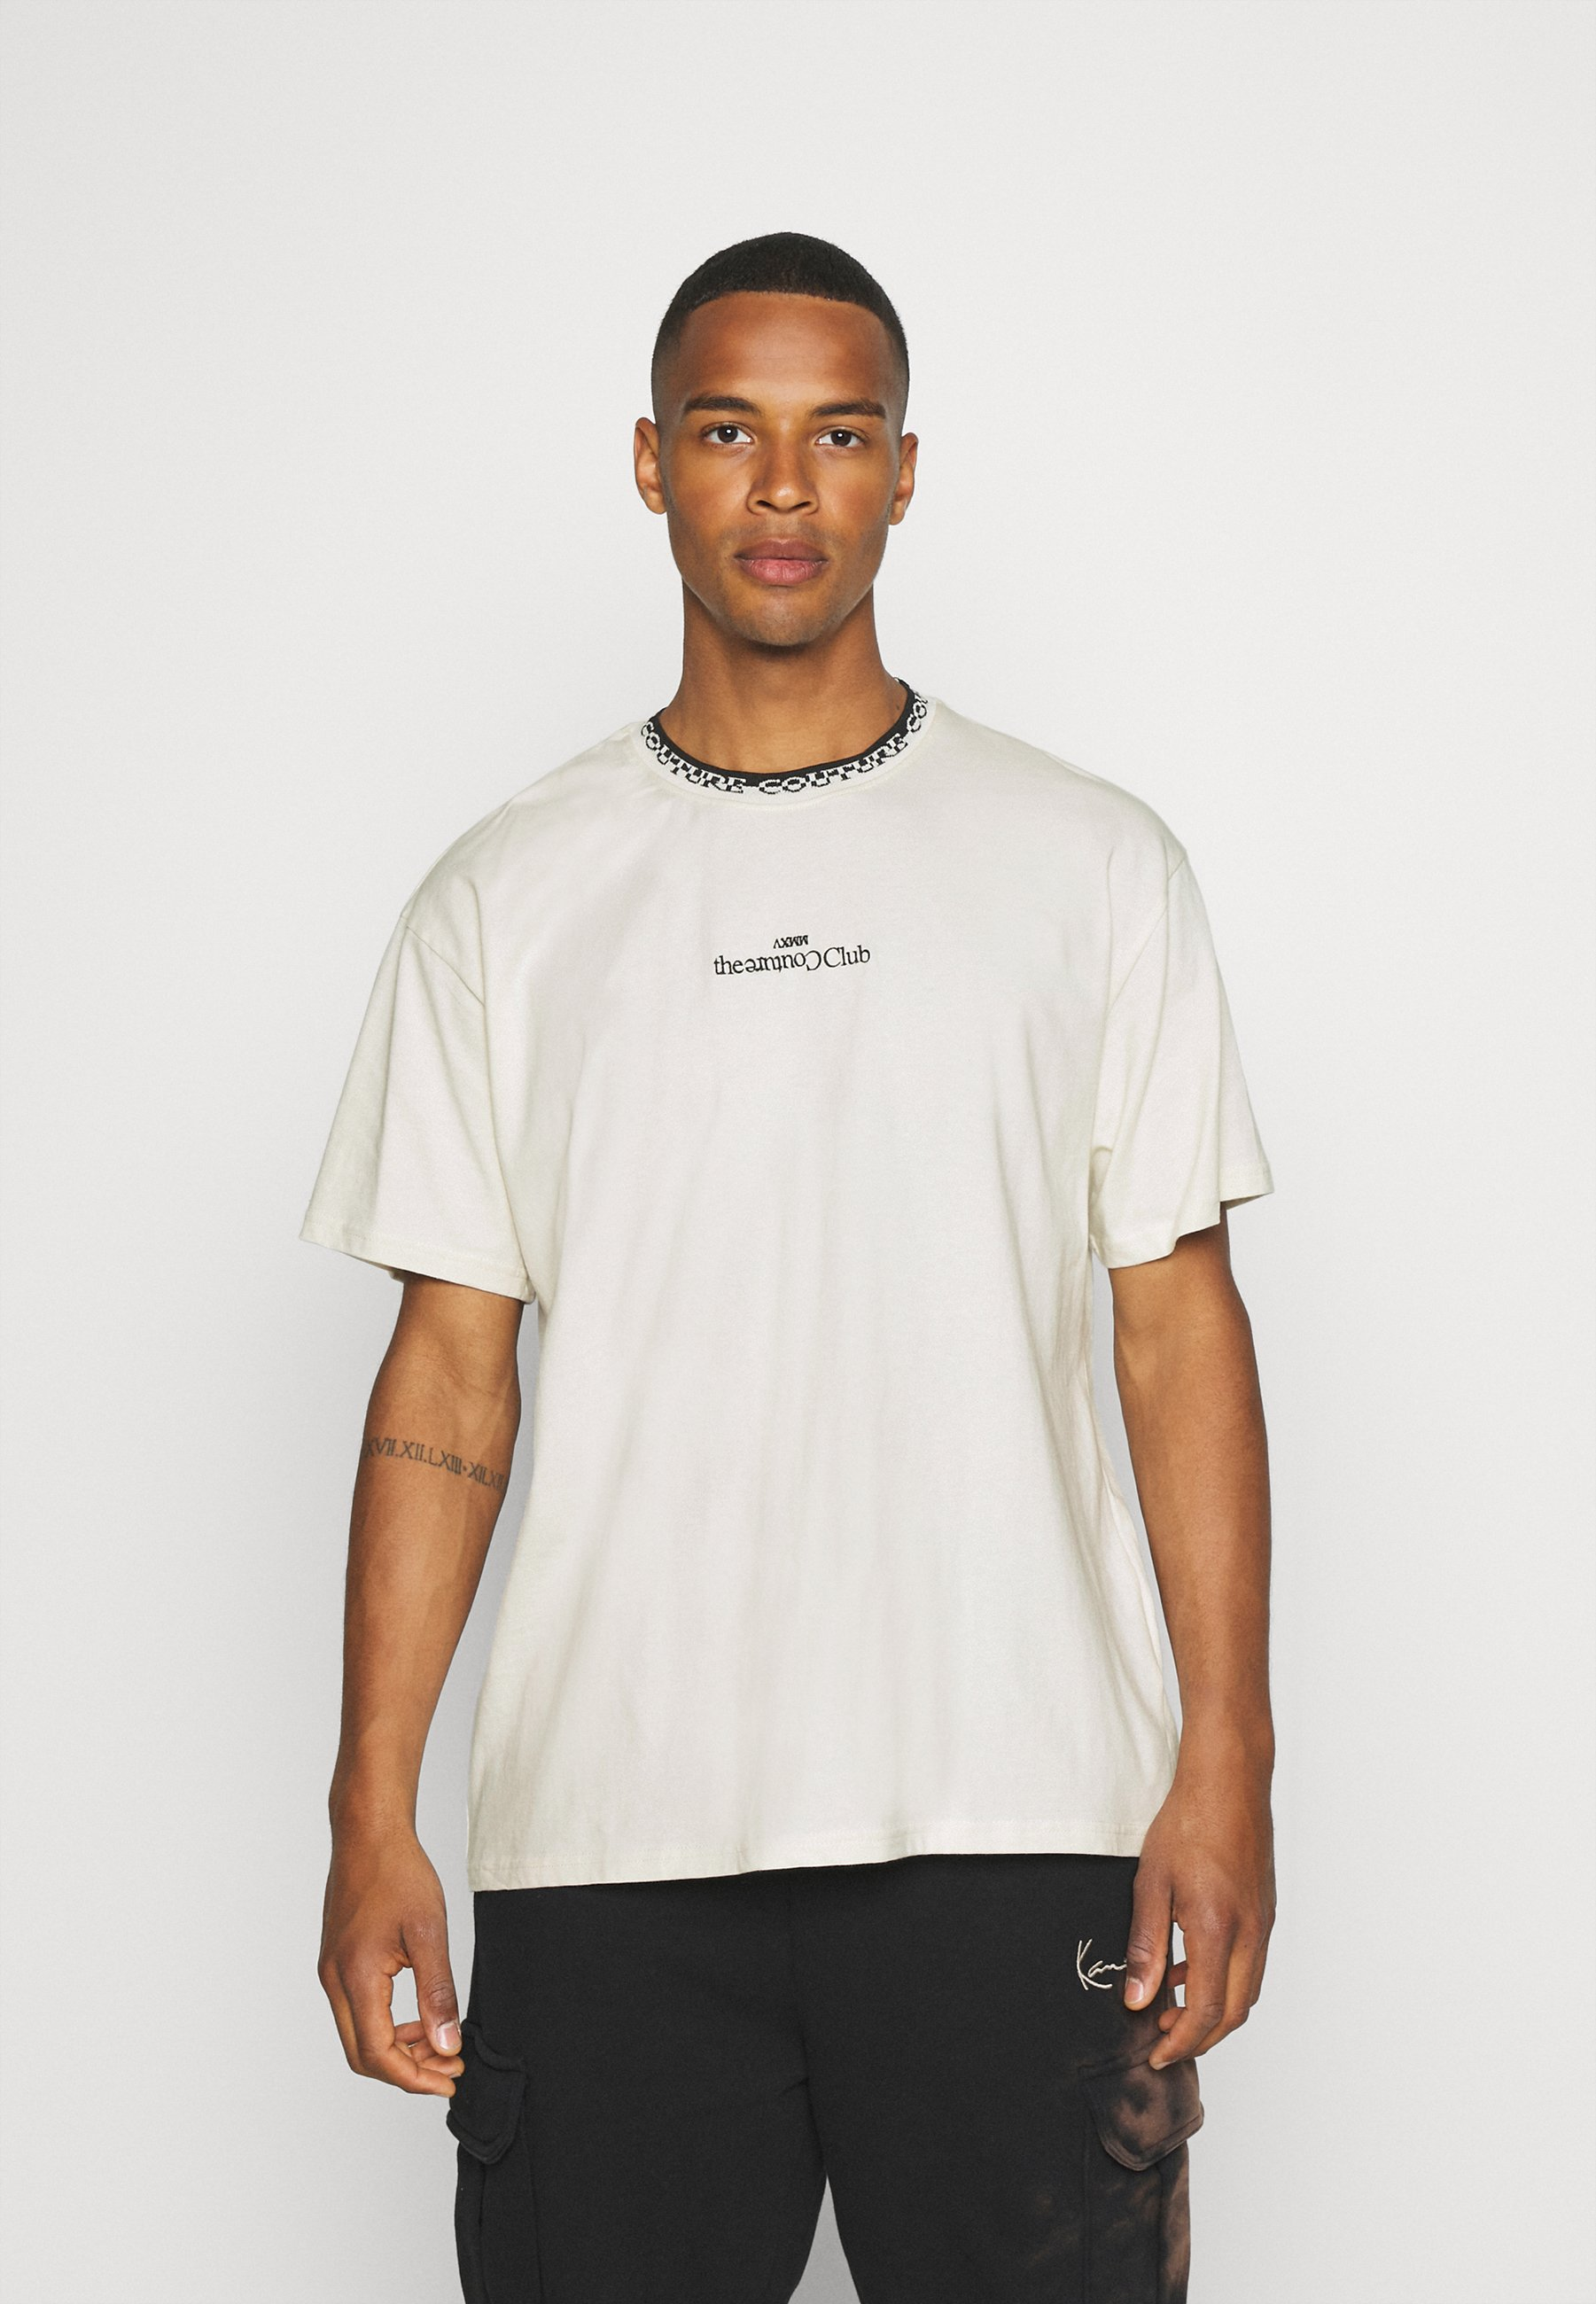 Men CONTRAST LOGO JACQUARD RELAXED T-SHIRT - Print T-shirt